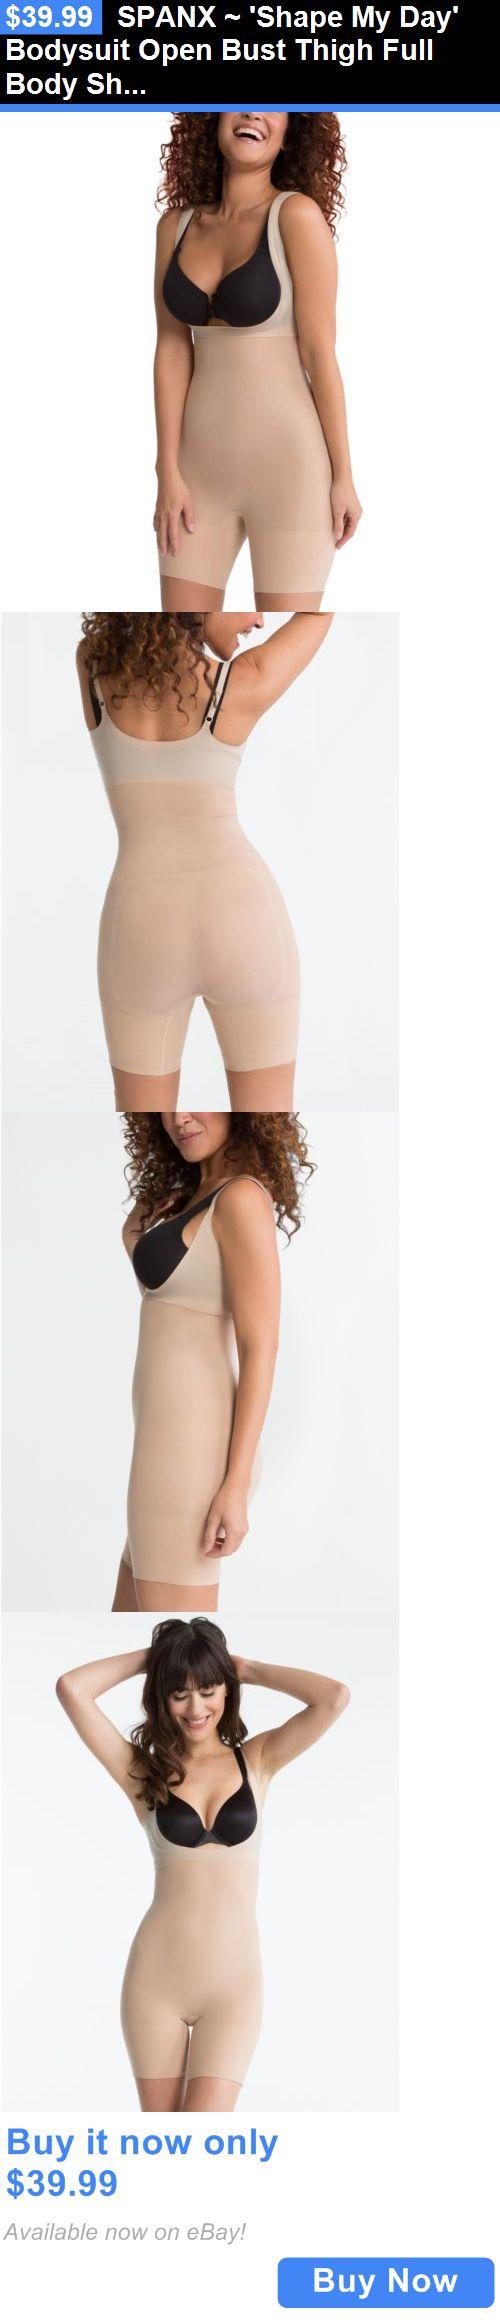 Women Shapewear: Spanx ~ Shape My Day Bodysuit Open Bust Thigh Full Body Shaper ~ Nude S Small BUY IT NOW ONLY: $39.99